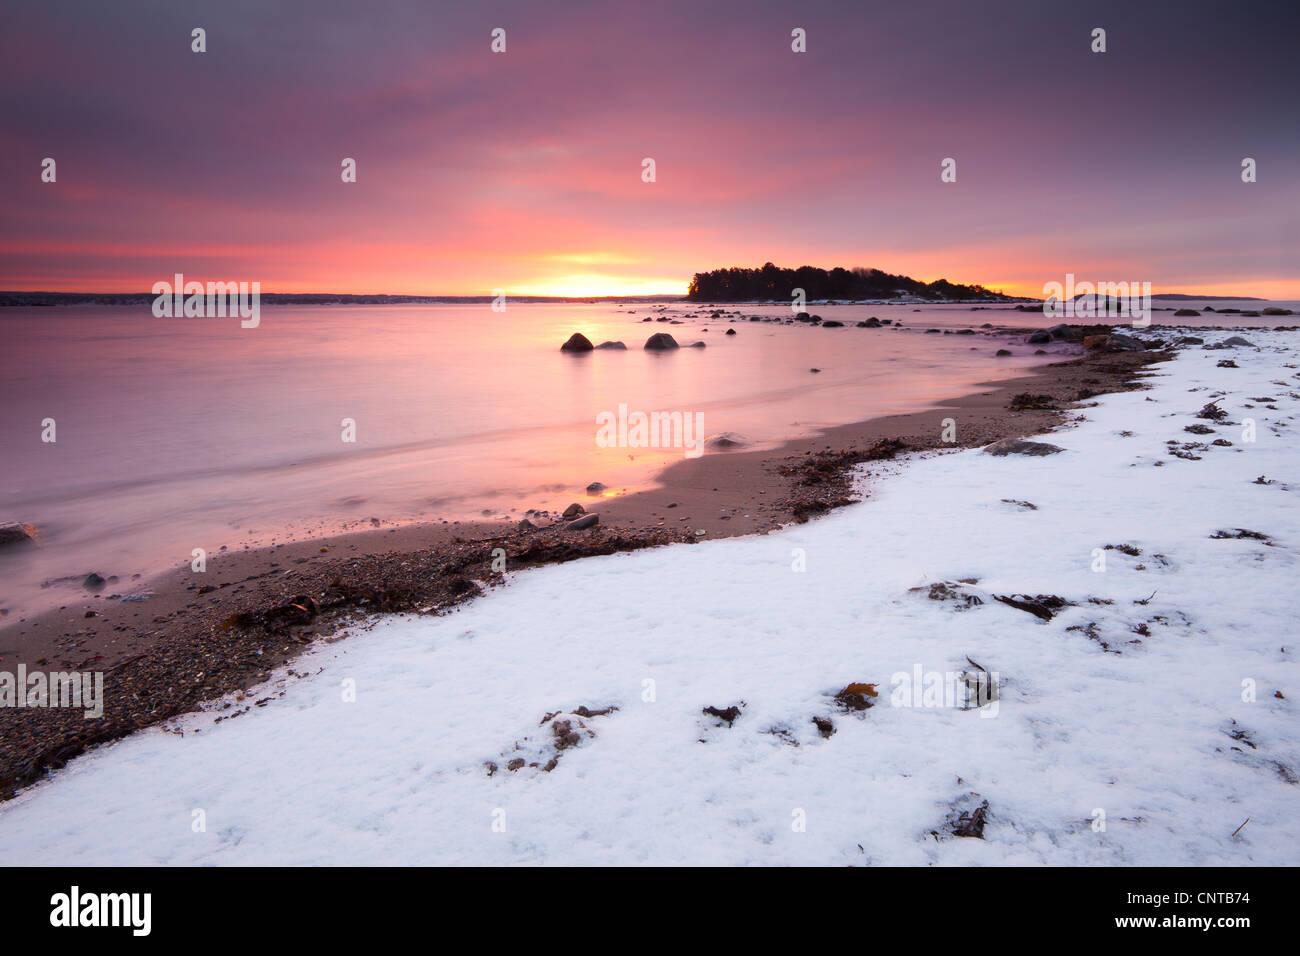 Winter sunrise at Larkollen in Rygge, Østfold fylke, Norway. - Stock Image